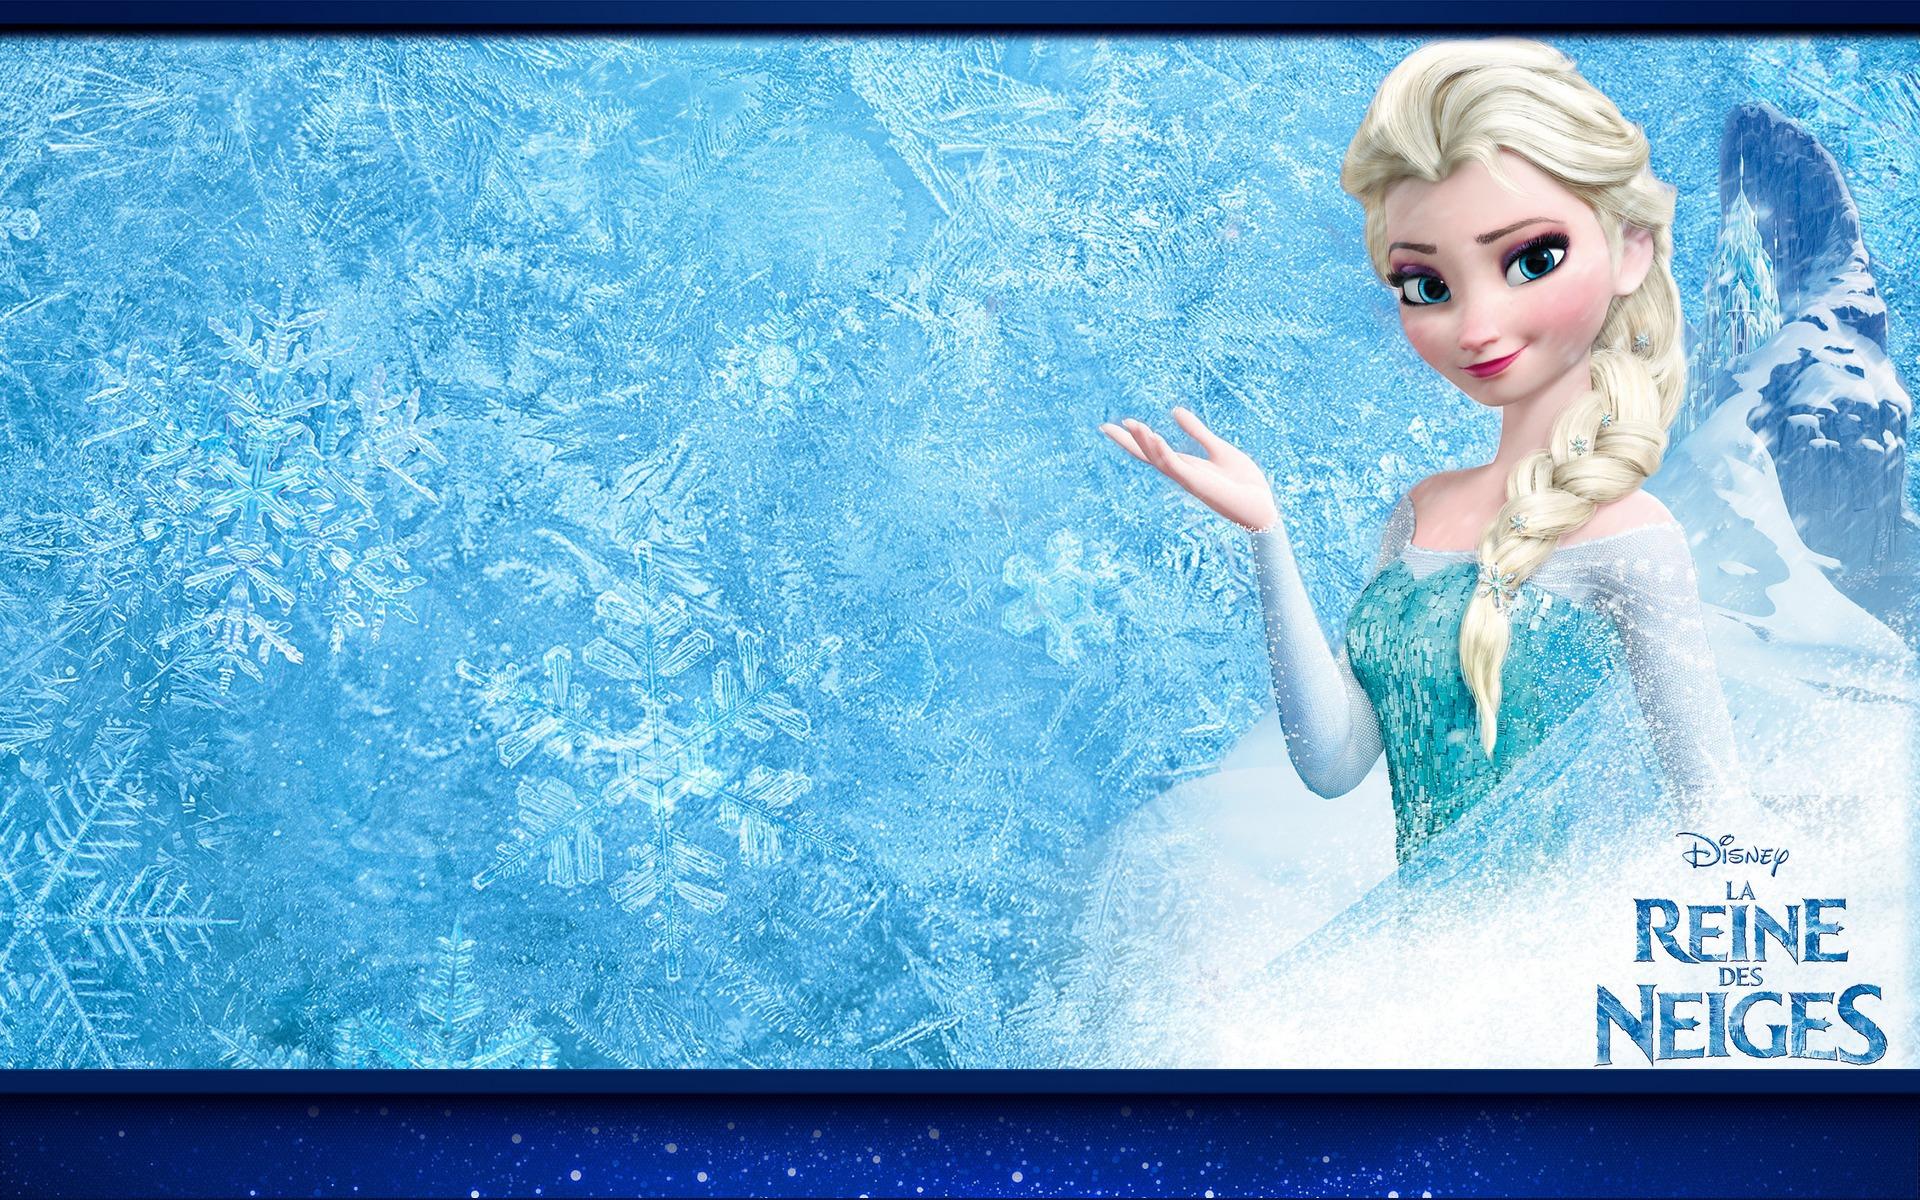 fond d'ecran anime reine des neiges